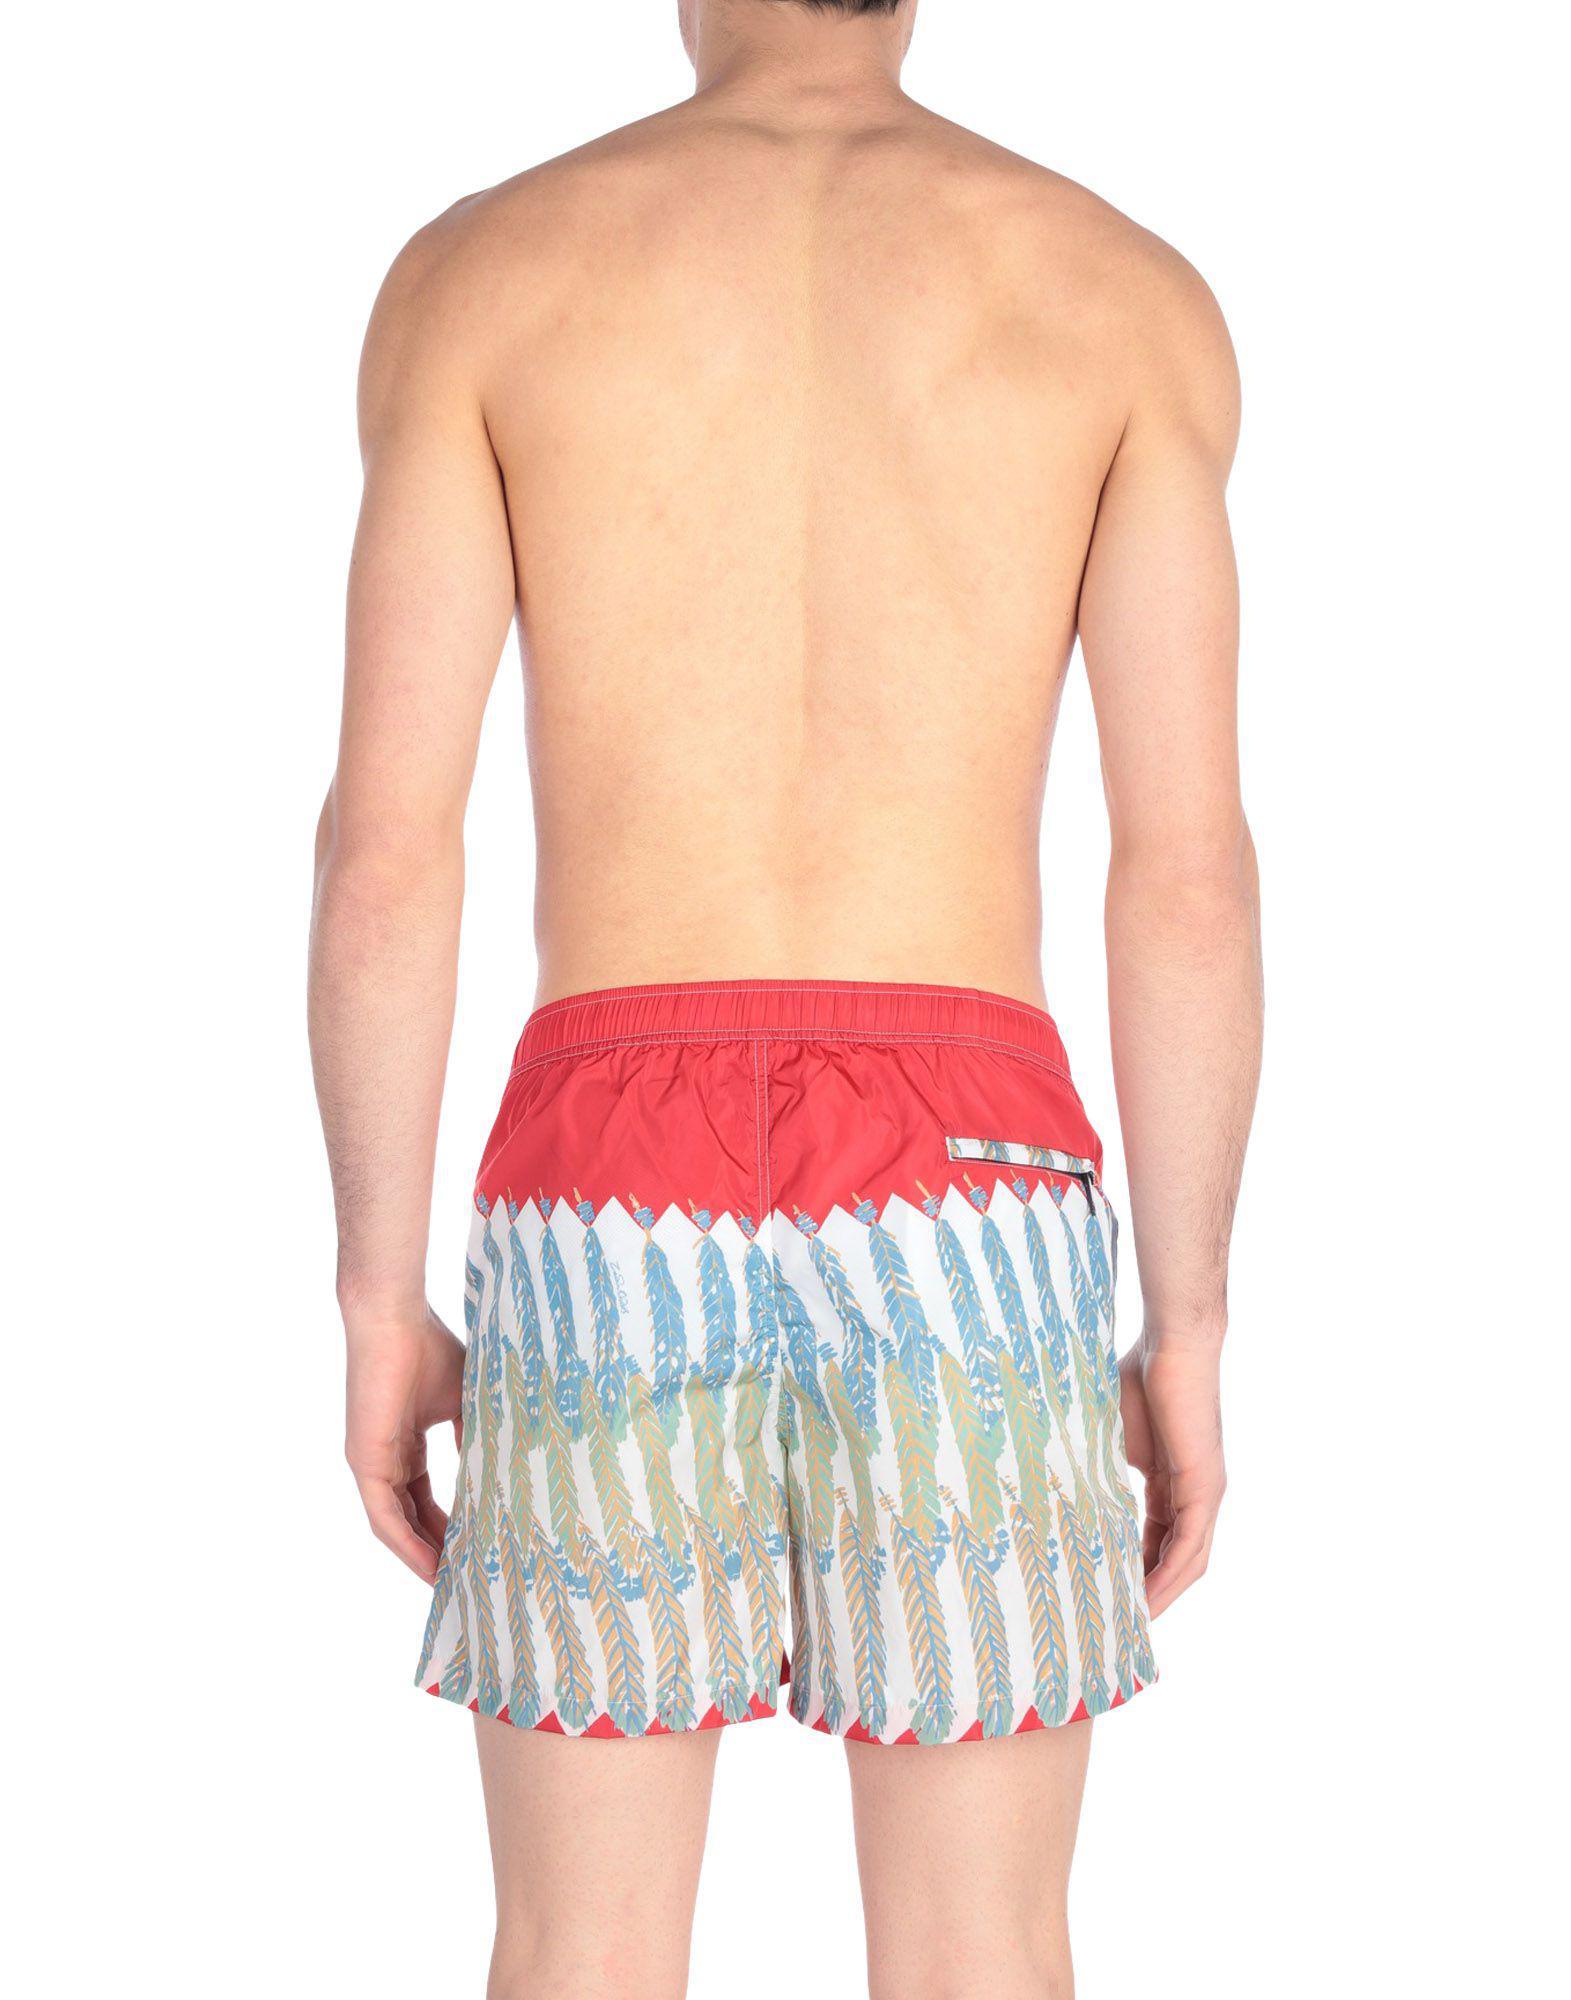 417f9ba437 Valentino Swim Trunks in Red for Men - Lyst